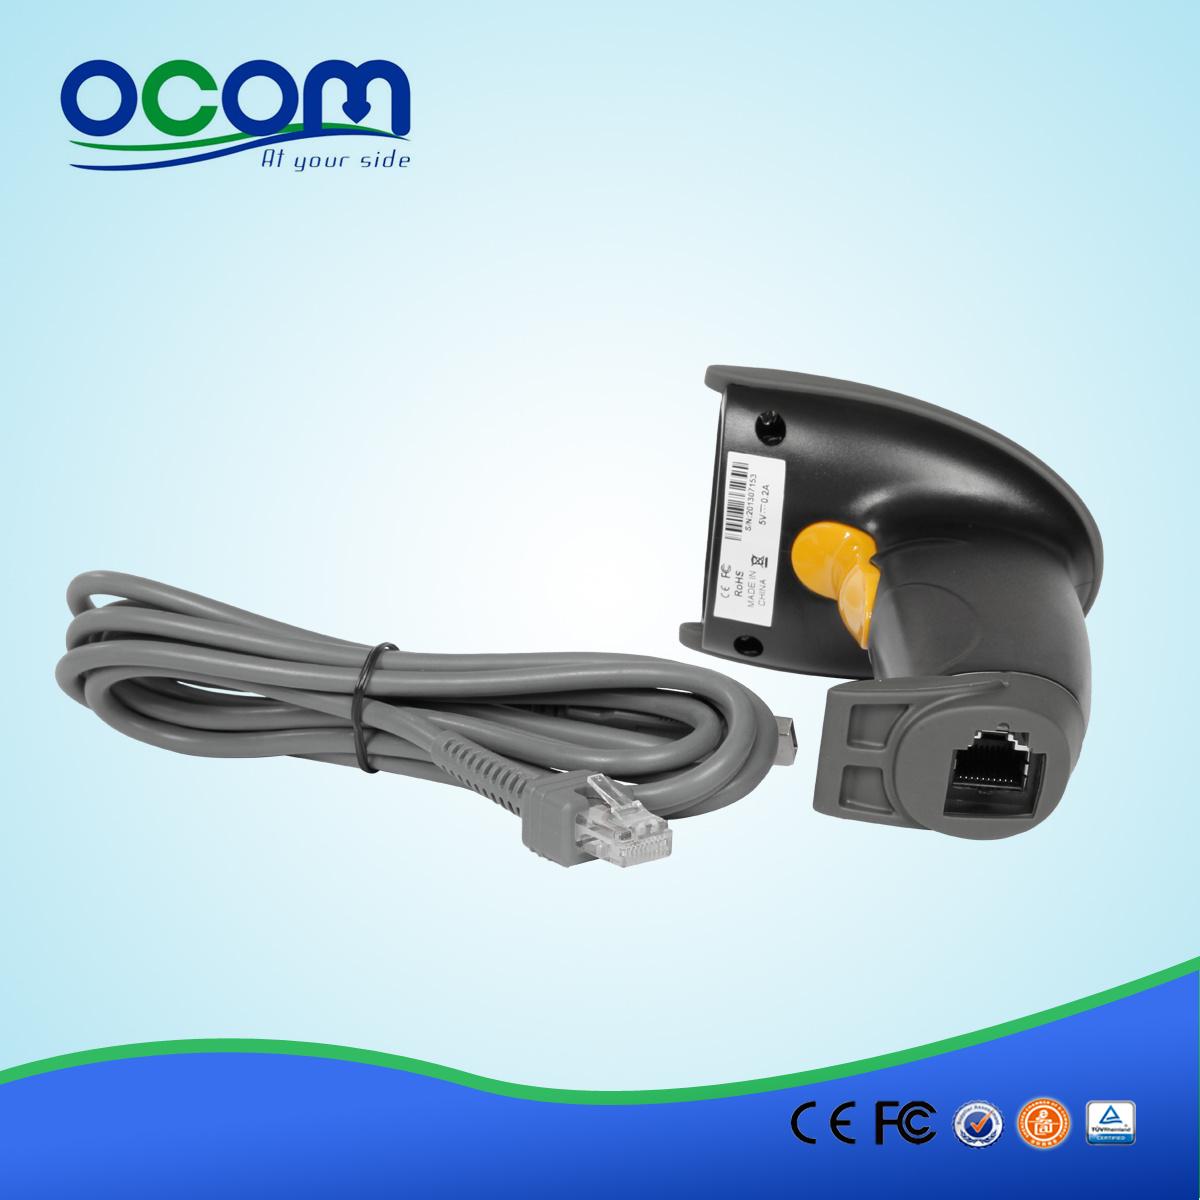 Ocbs-La11 Auto Sense Laser Micro USB Barcode Scanner